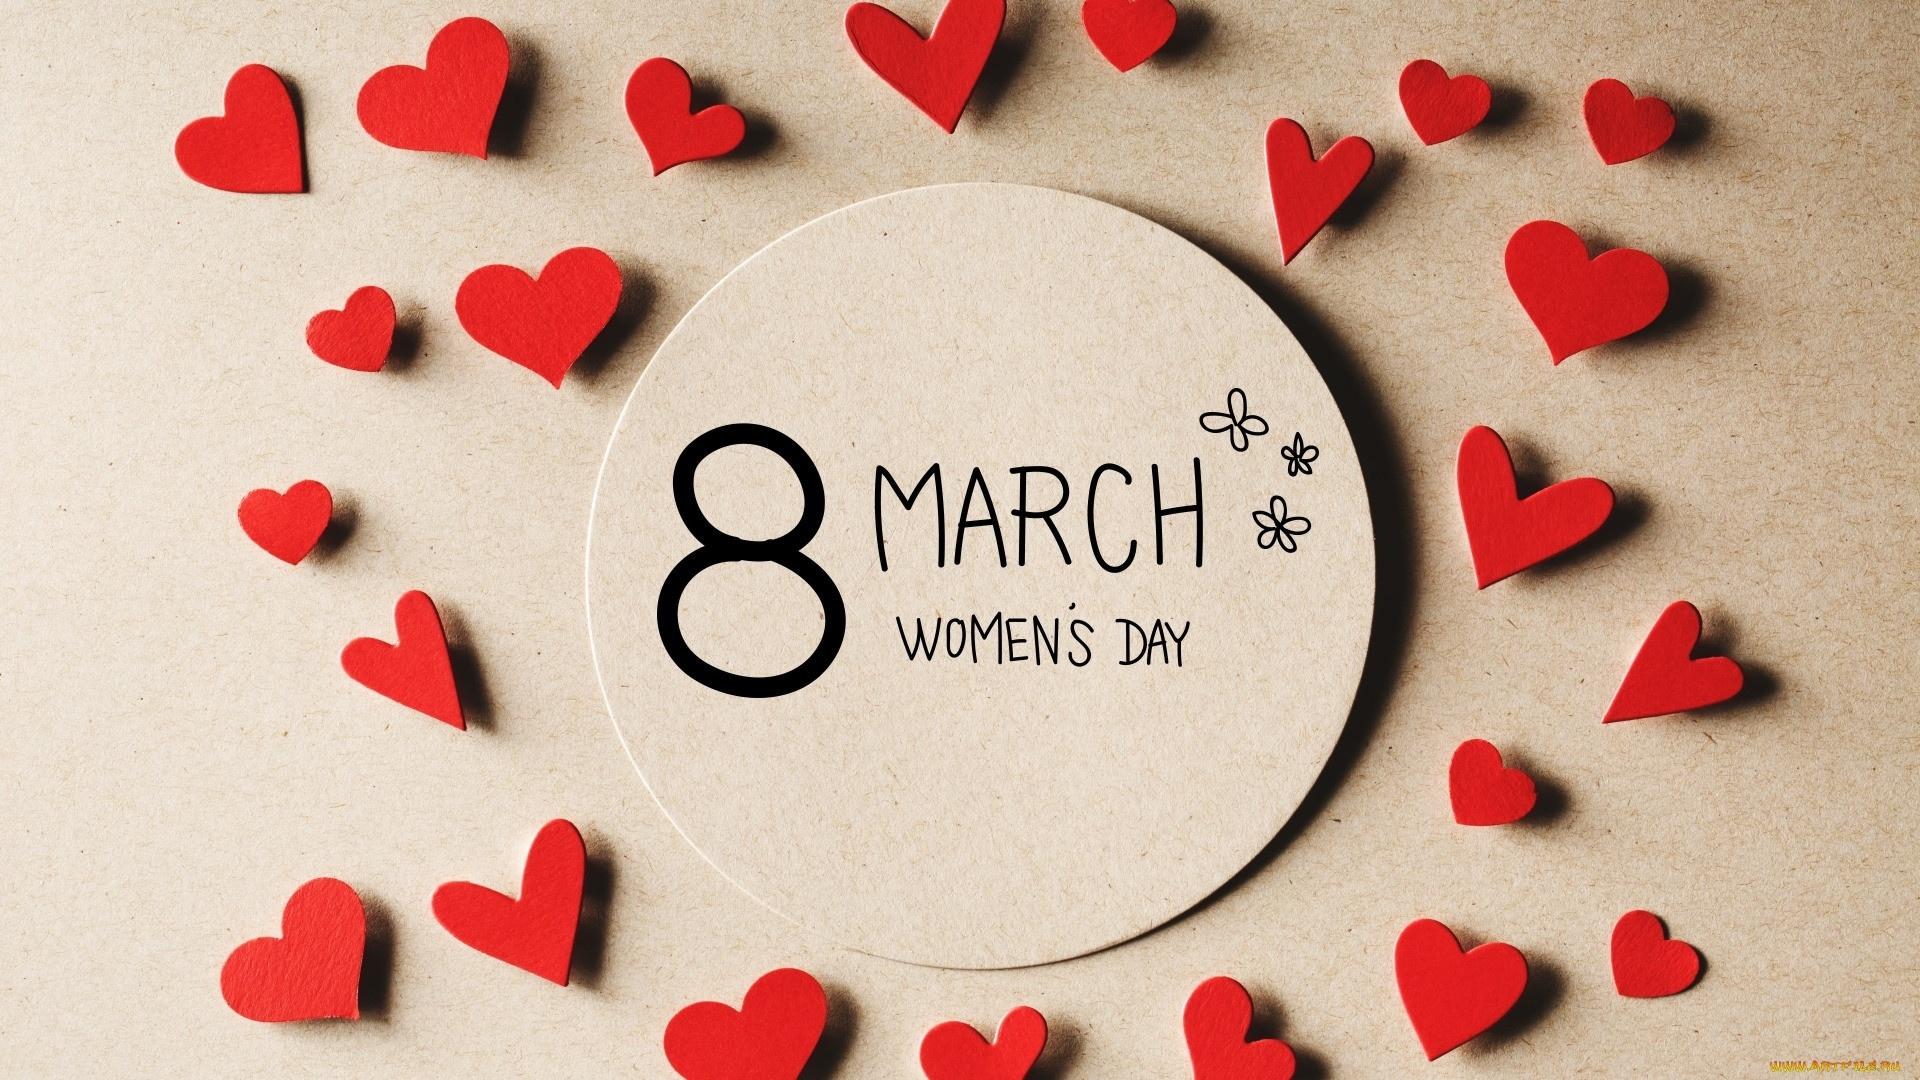 Women's Day 2021 wallpaper photo hd